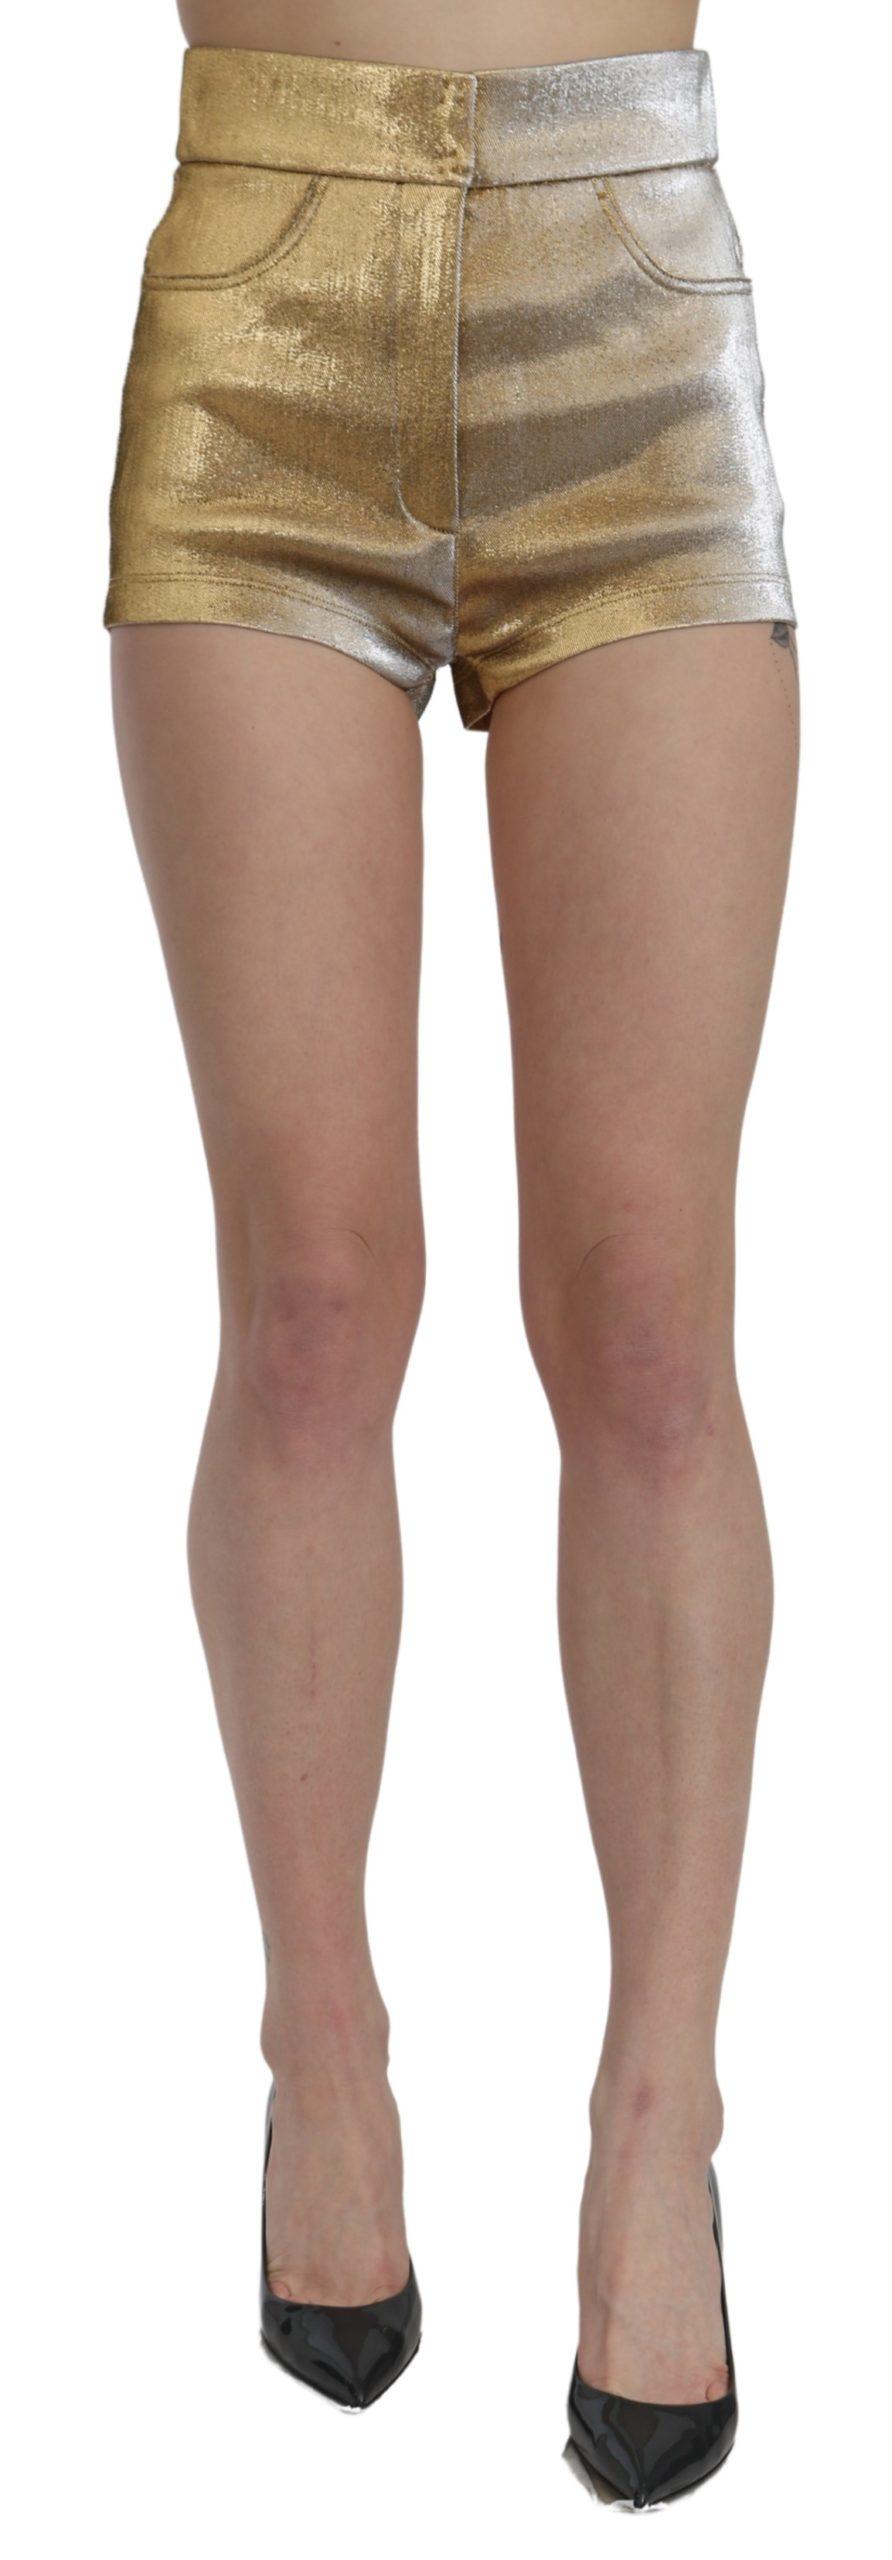 Dolce & Gabbana Women's High Waist Mini Hot Pants Cotton Shorts Gold SKI1440 - IT42|M